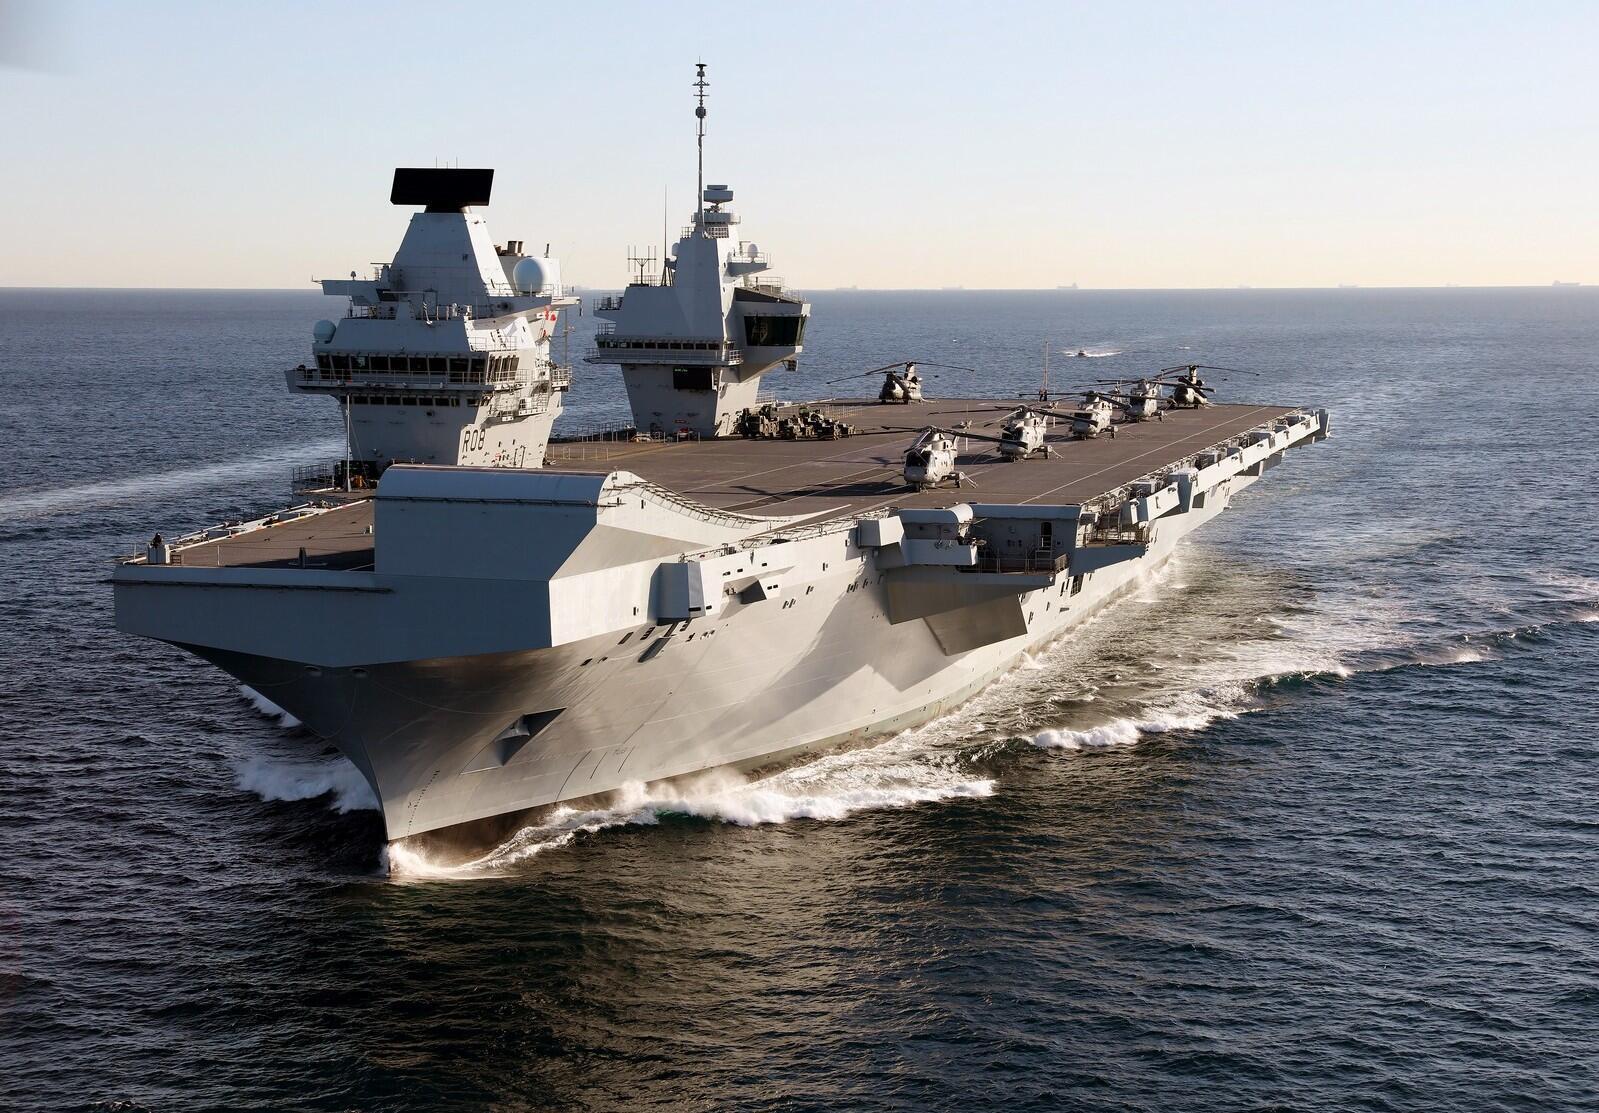 HMS_Queen_Elizabeth_in_Gibraltar_-_2018_(28386226189)